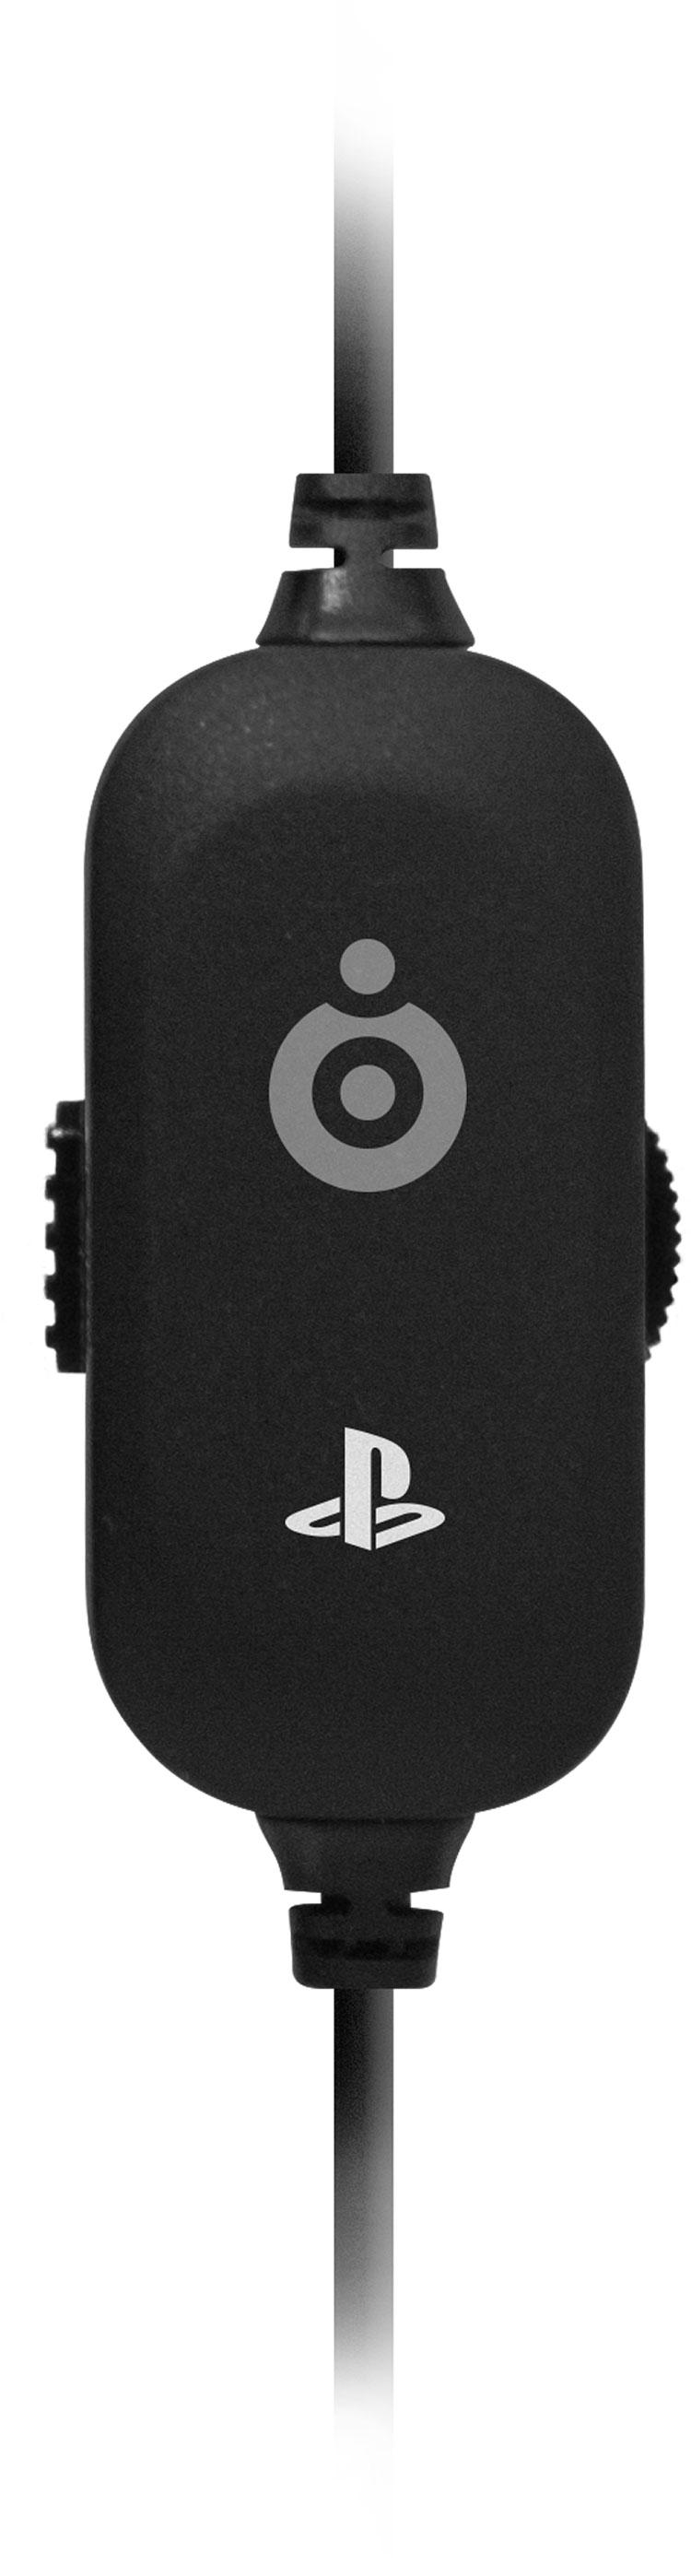 SONY Stereo Gaming Headset v2 - Image  #1